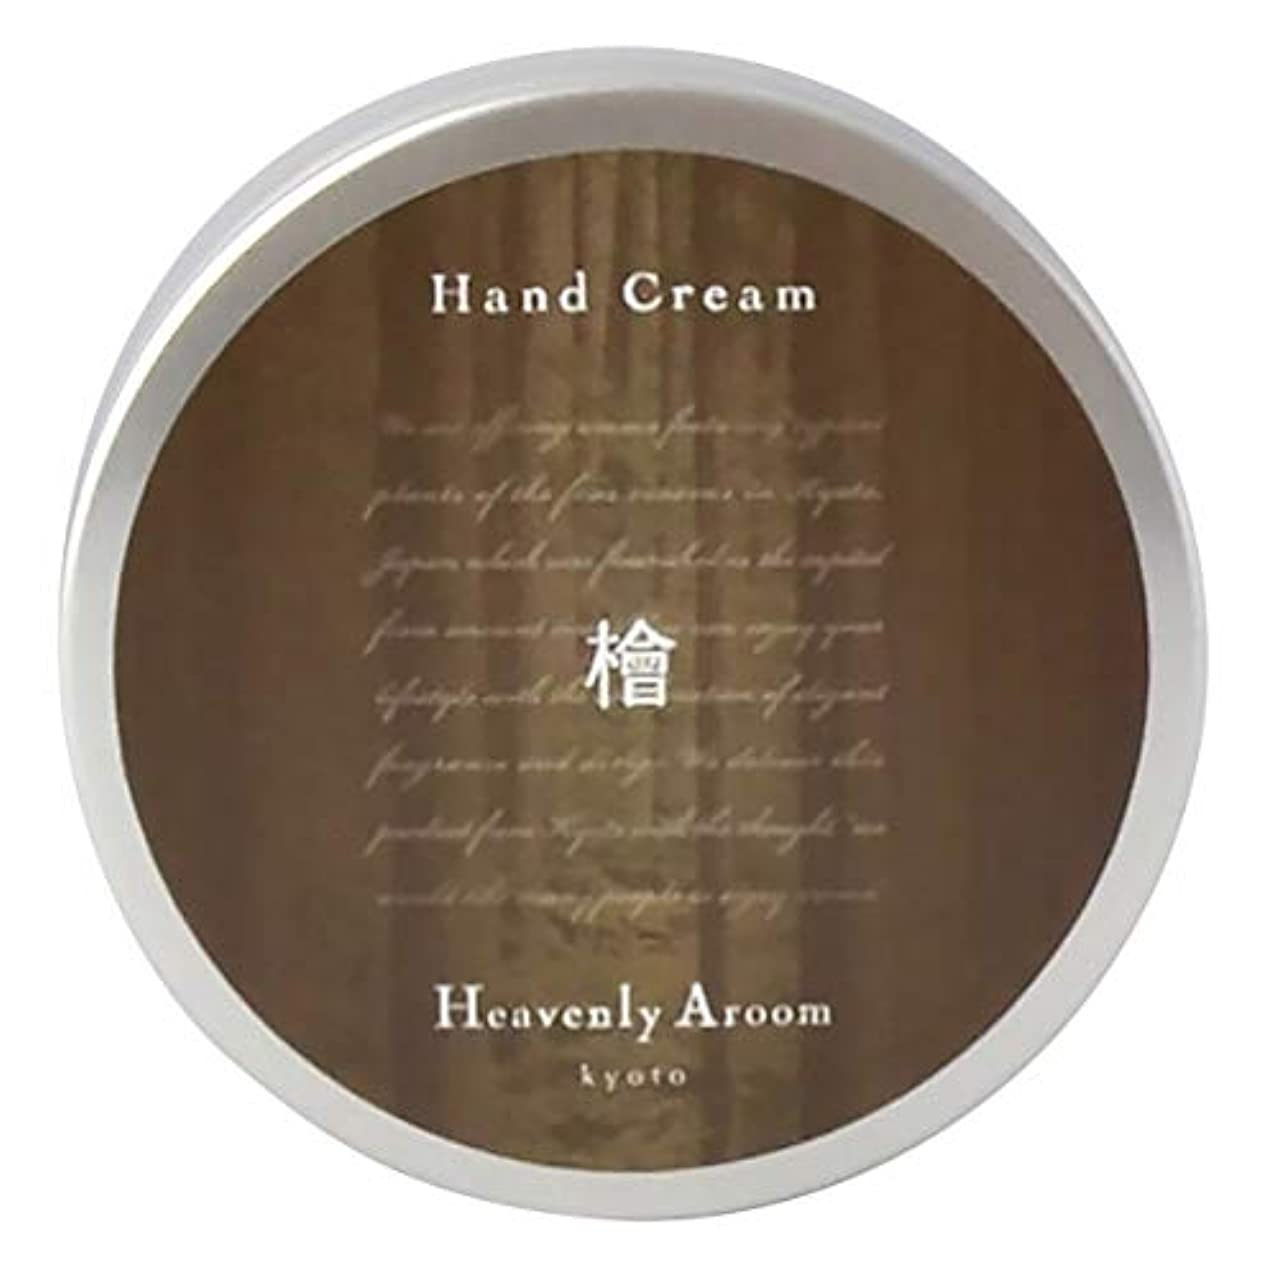 Heavenly Aroom ハンドクリーム 檜 30g